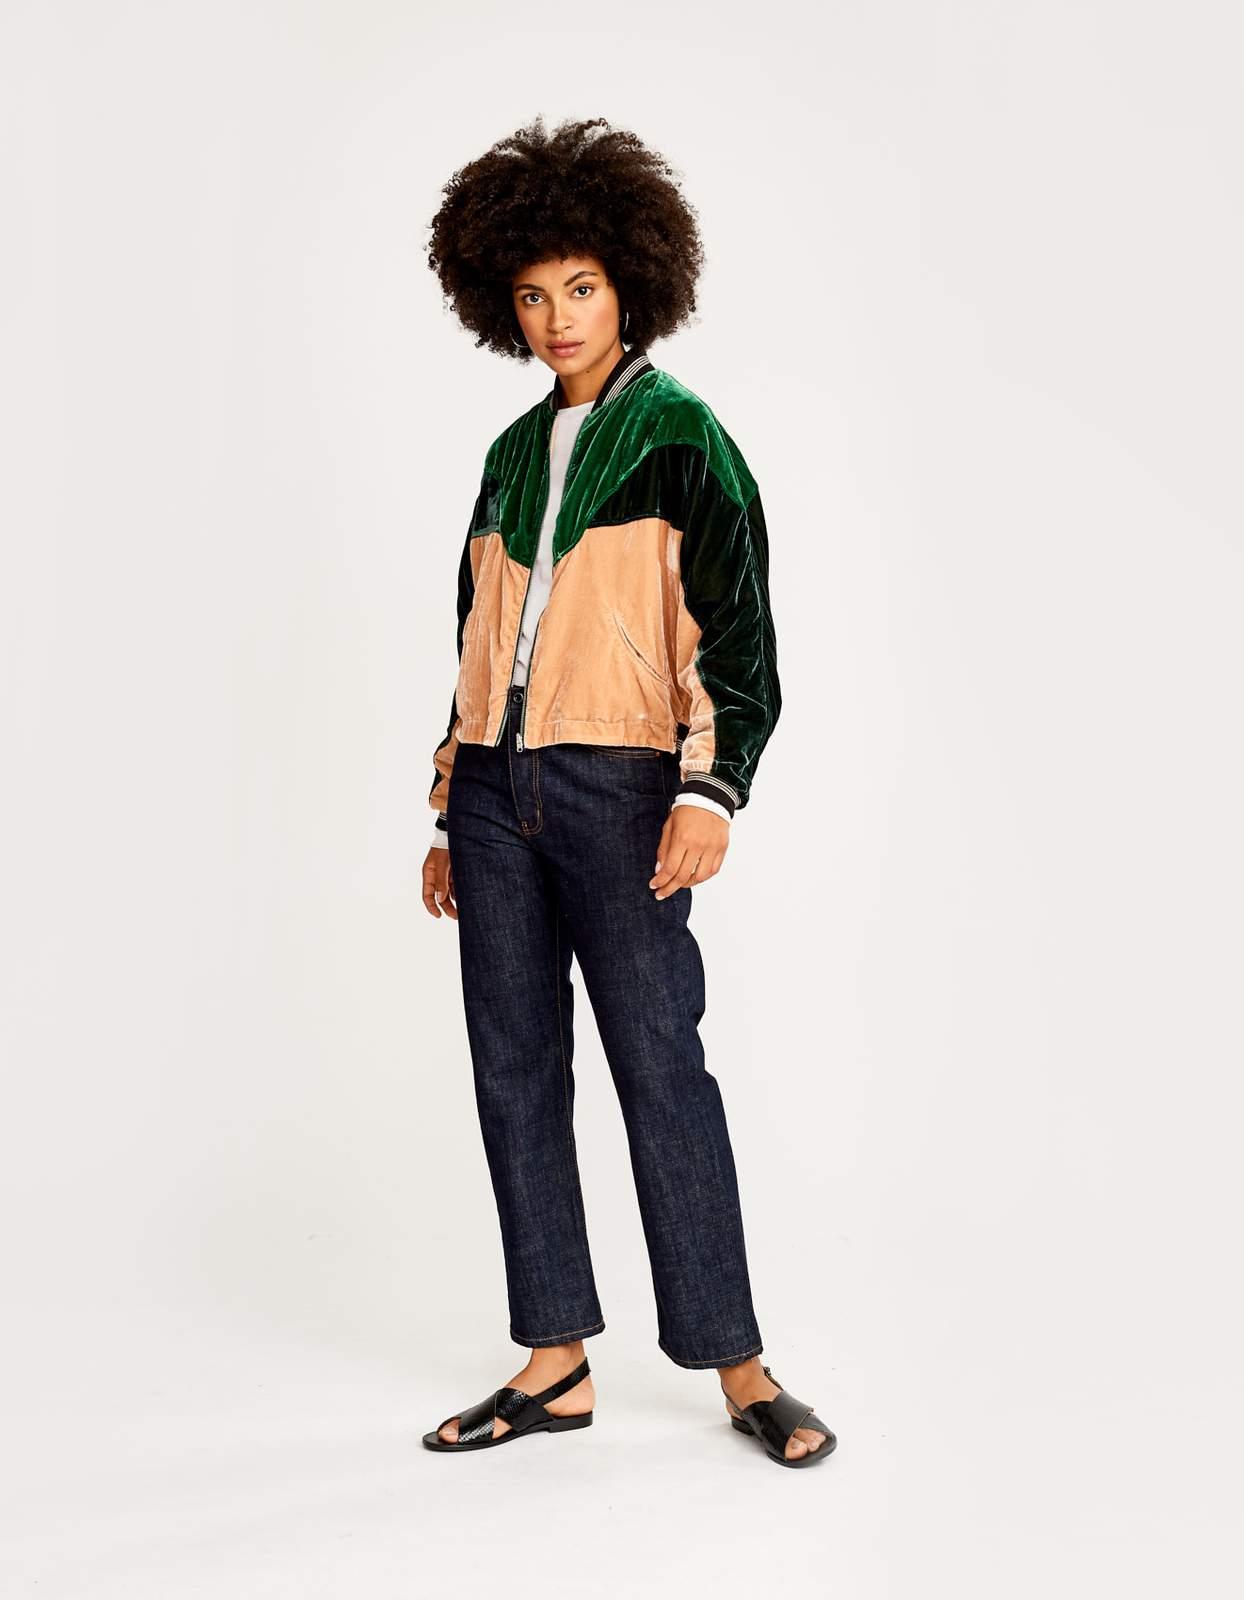 Bellerose-jacket-joe91-p1007_32_1600x1600.jpg